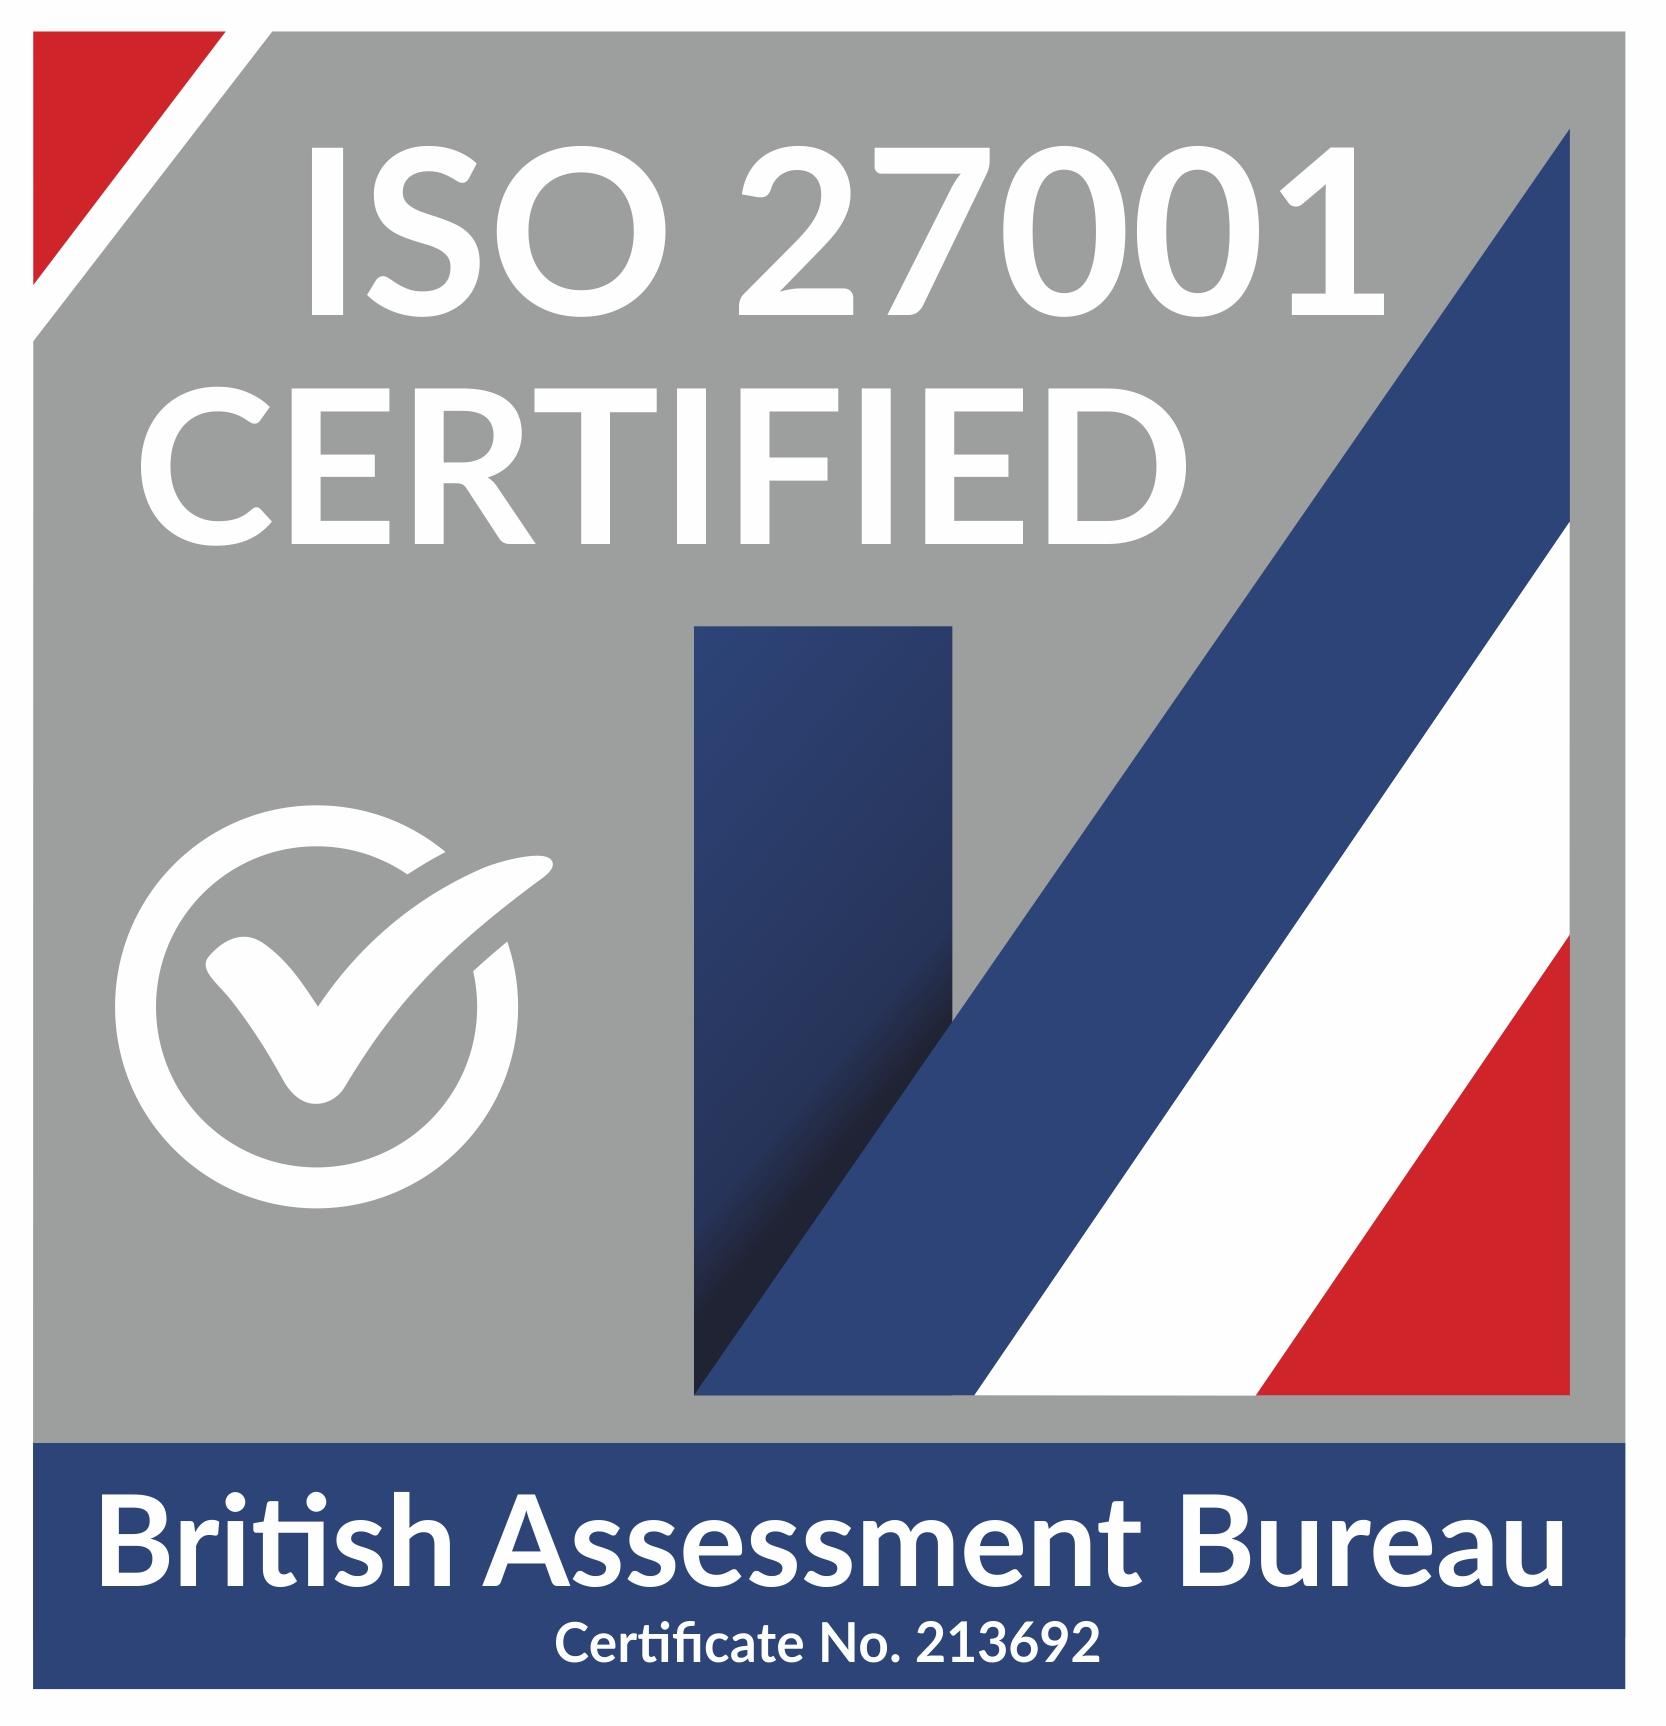 ISO accreditation badge